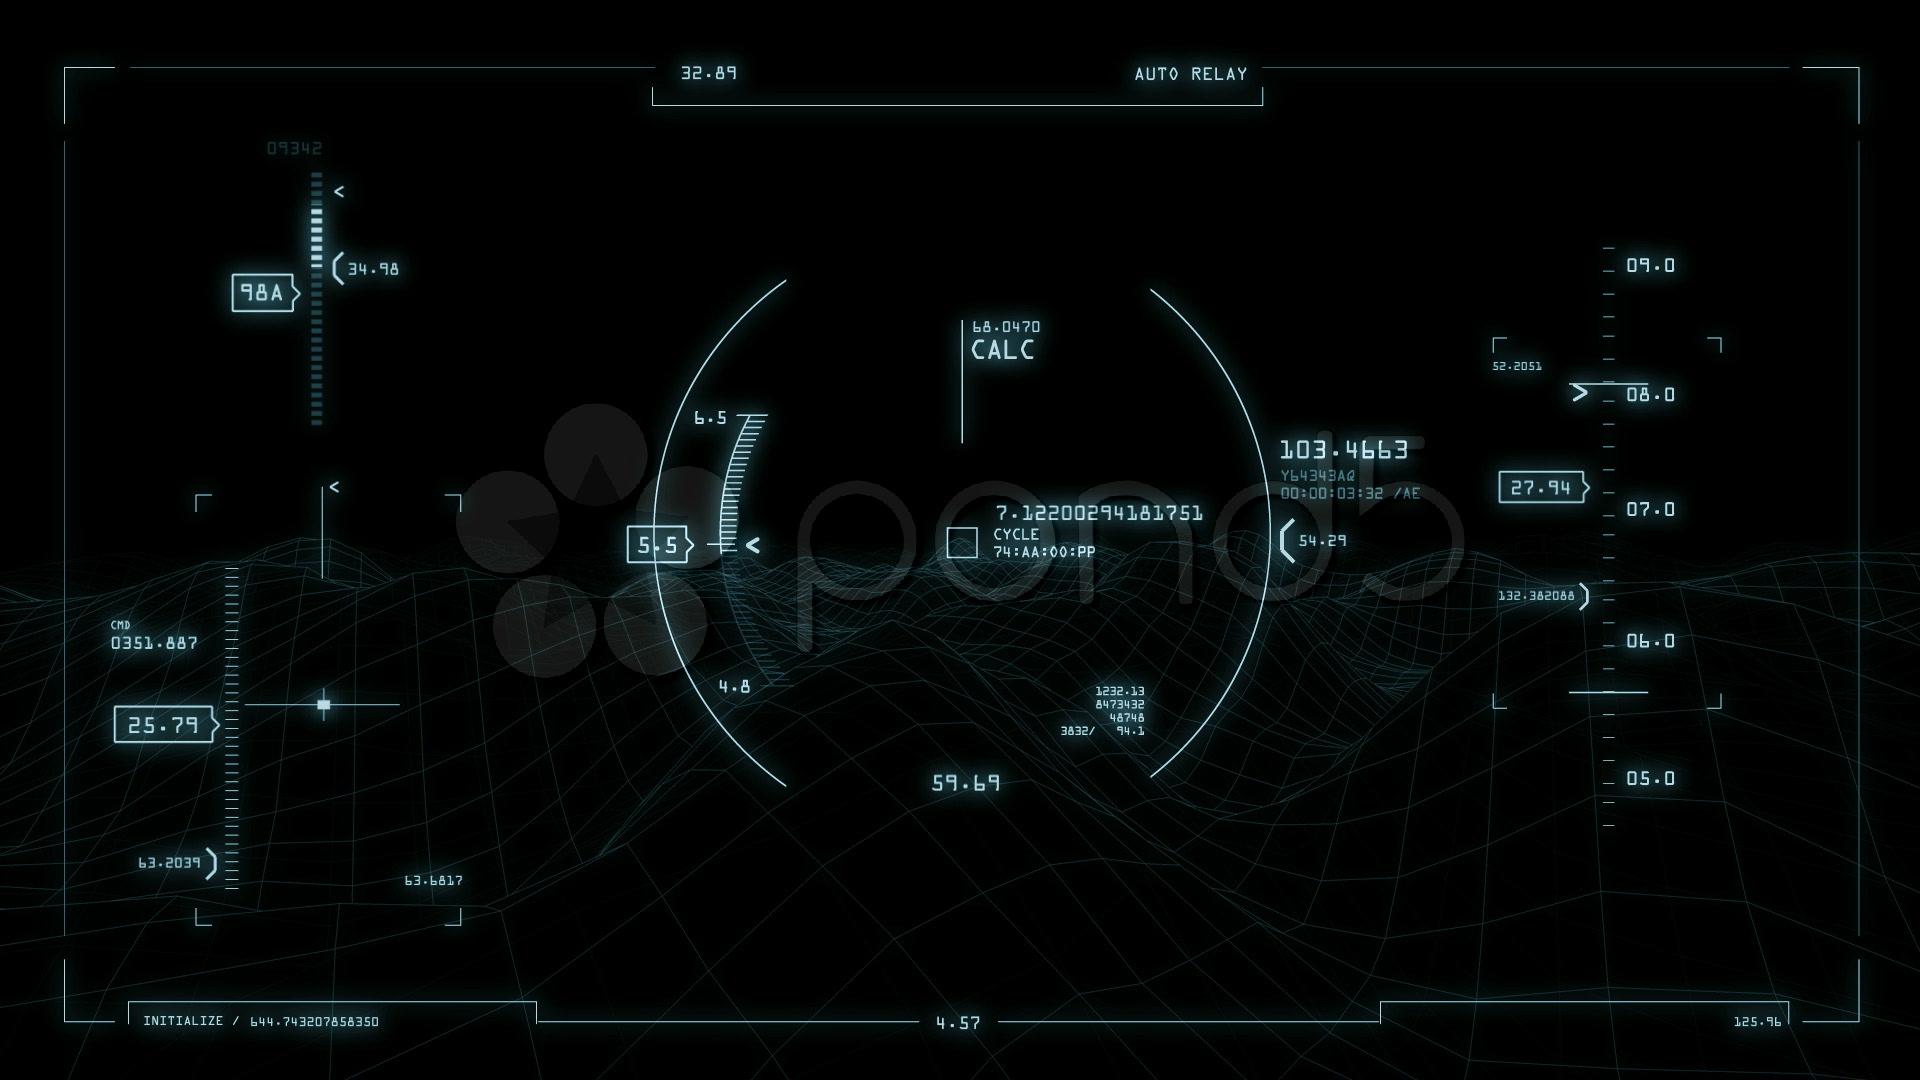 Interface Wallpapers - WallpaperSafari